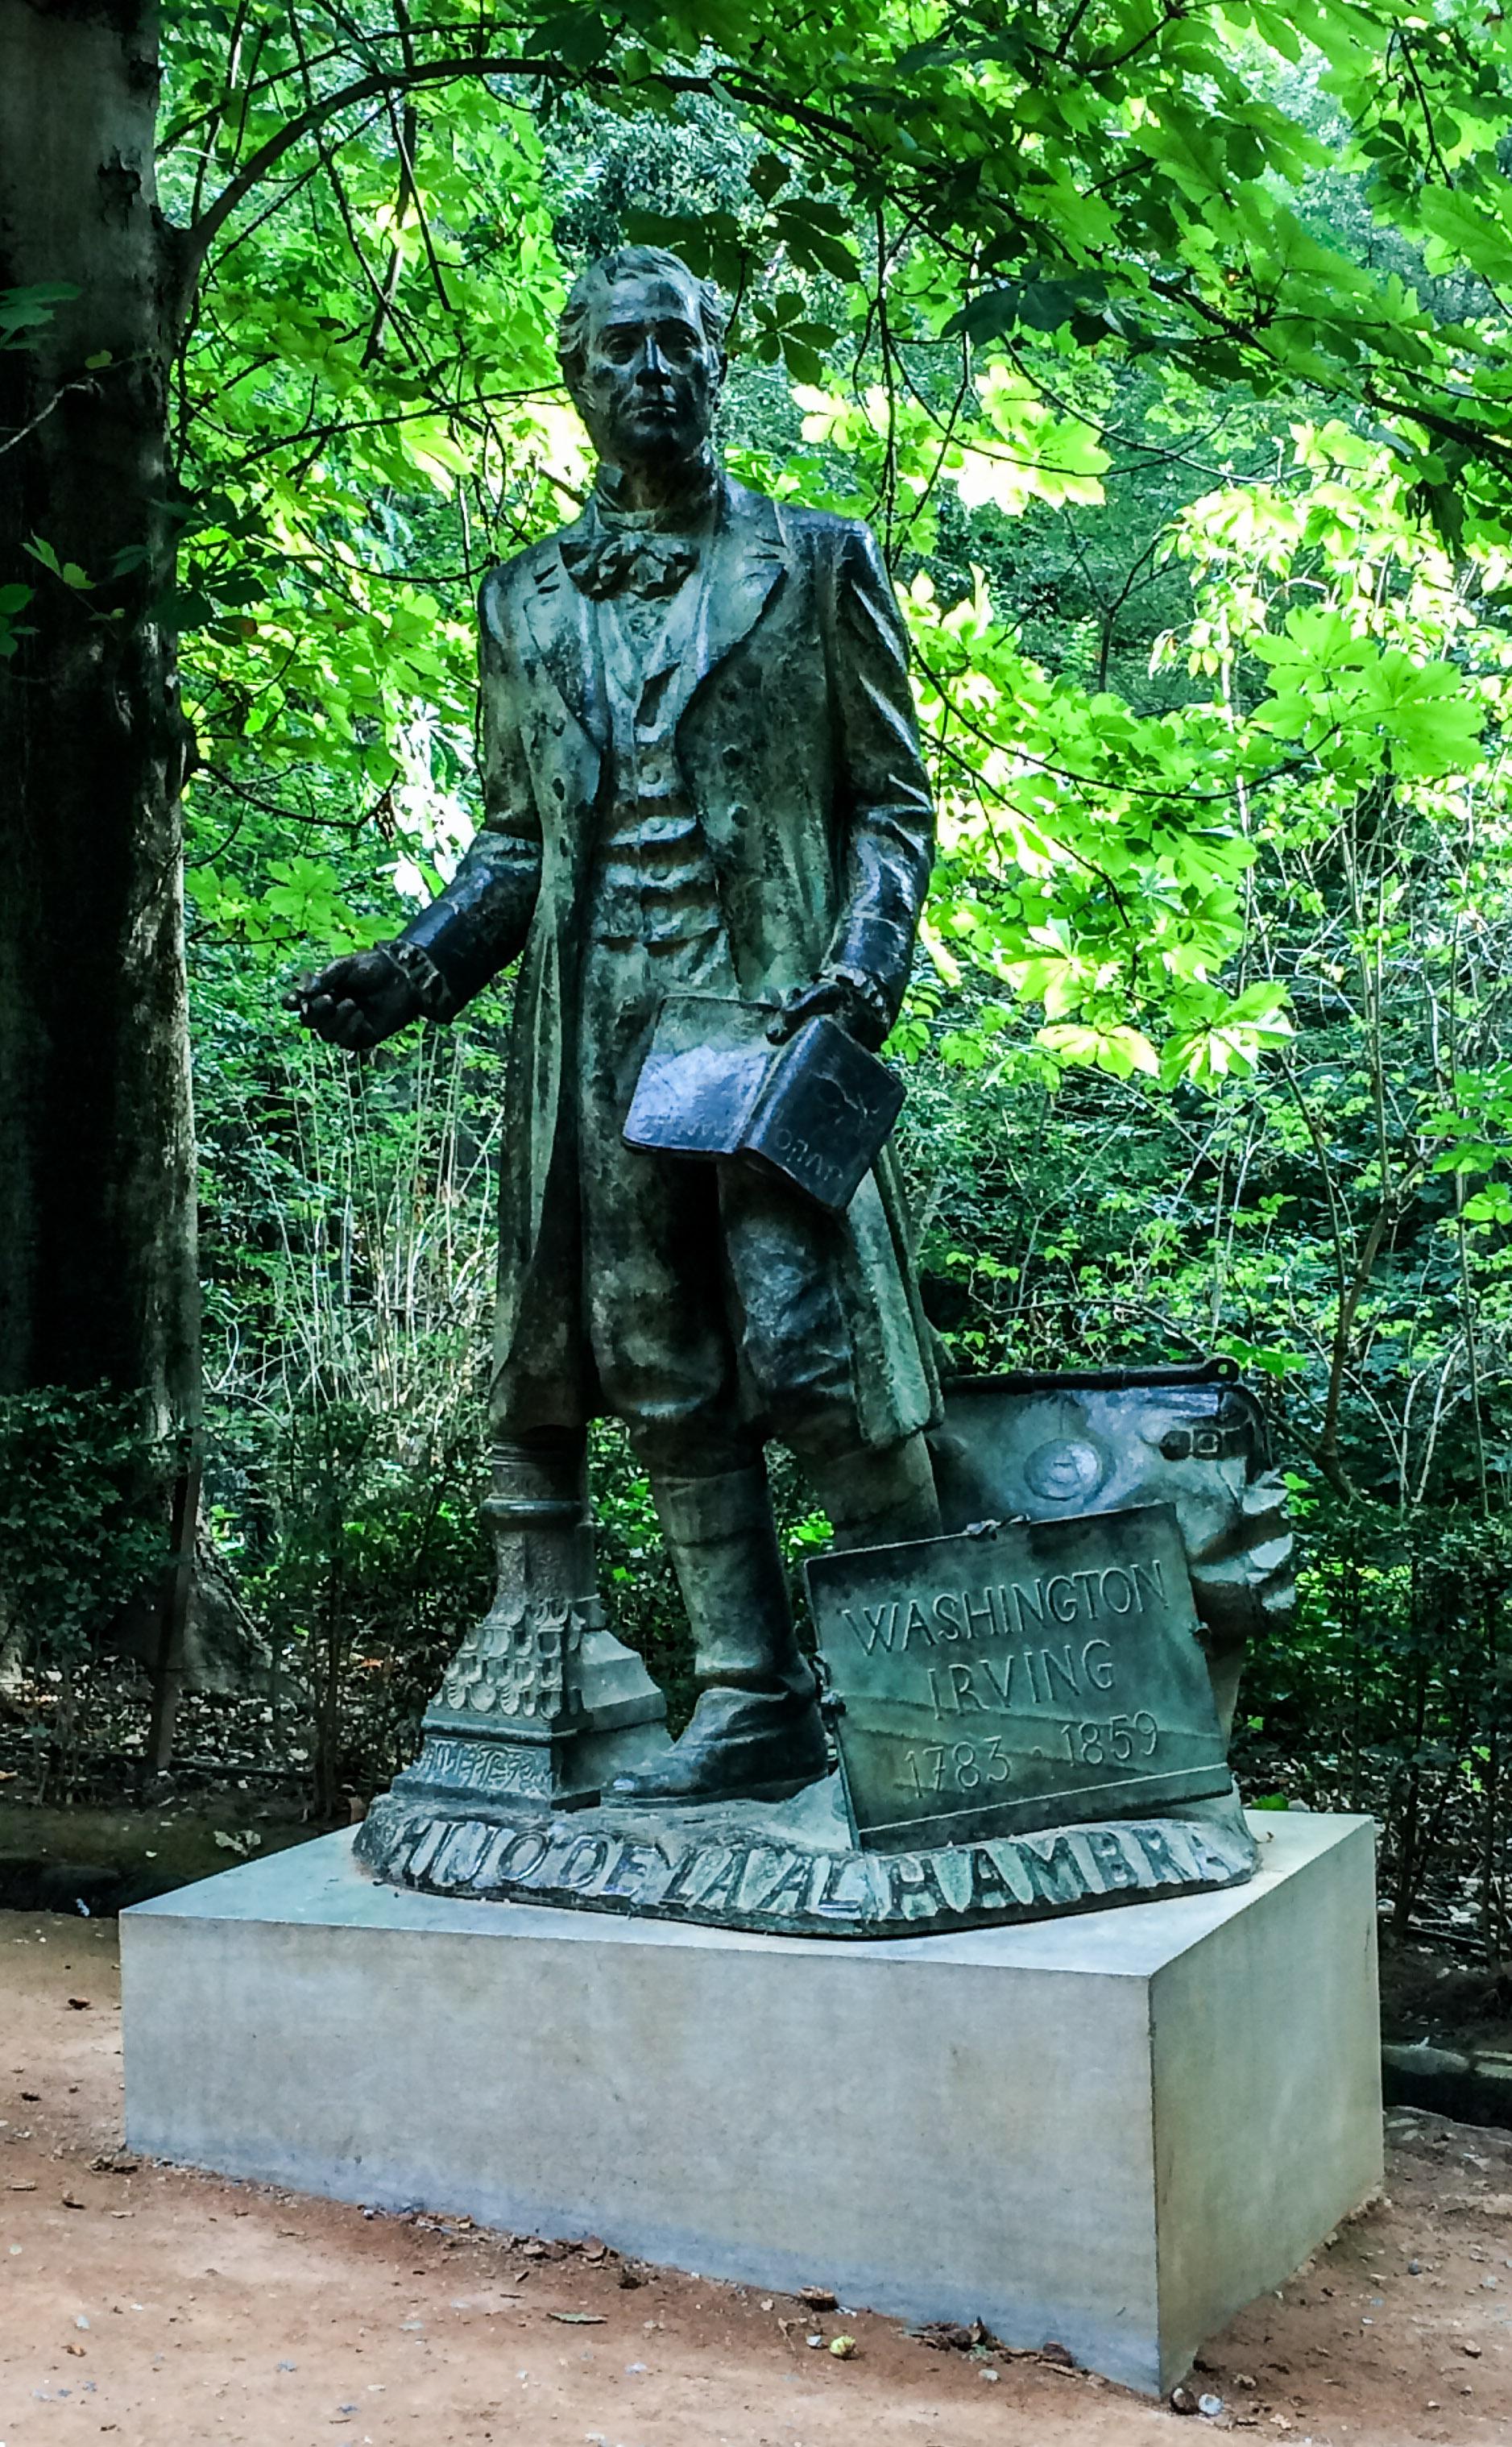 Washington Irving statue in Granada, Spain. Dawn Page / CoastsideSlacking